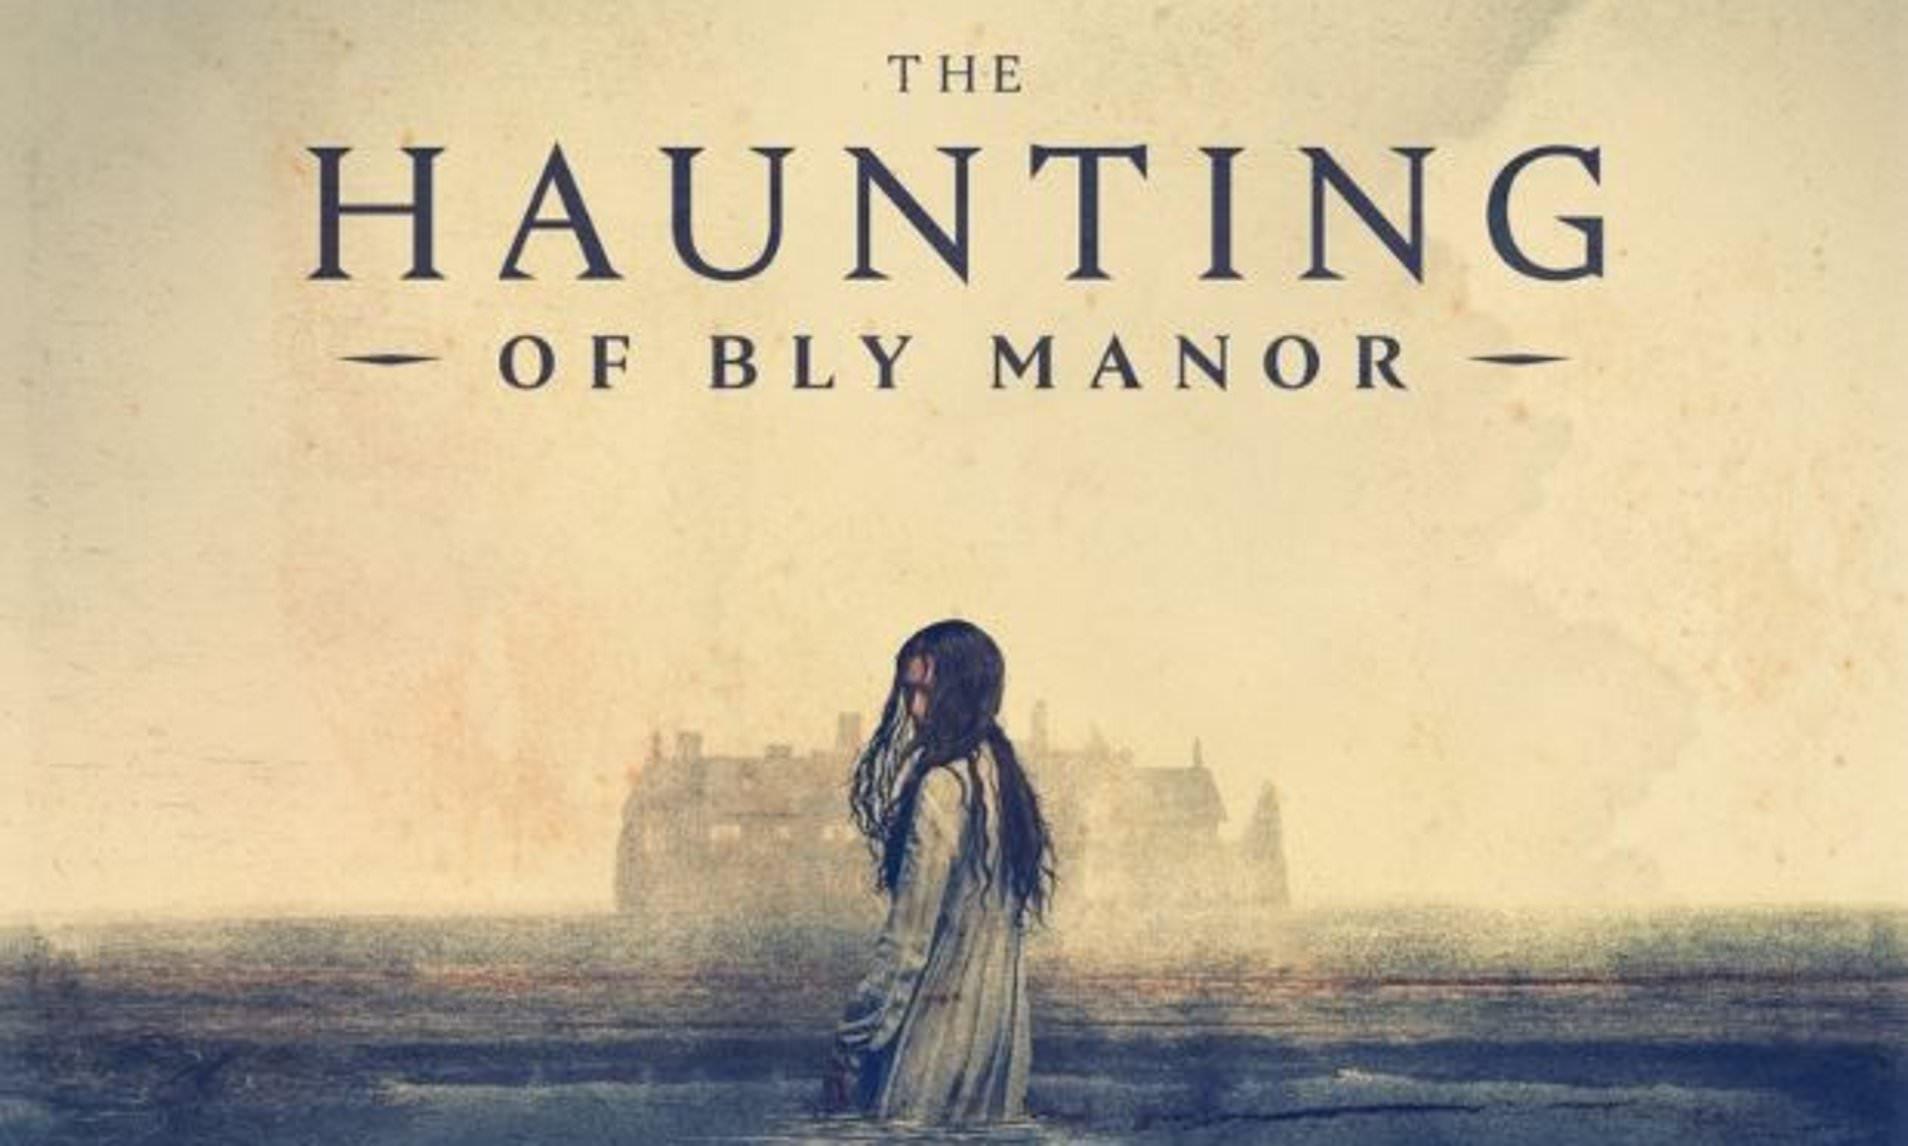 La serie de terror The Haunting of Bly Manor libera material promocional